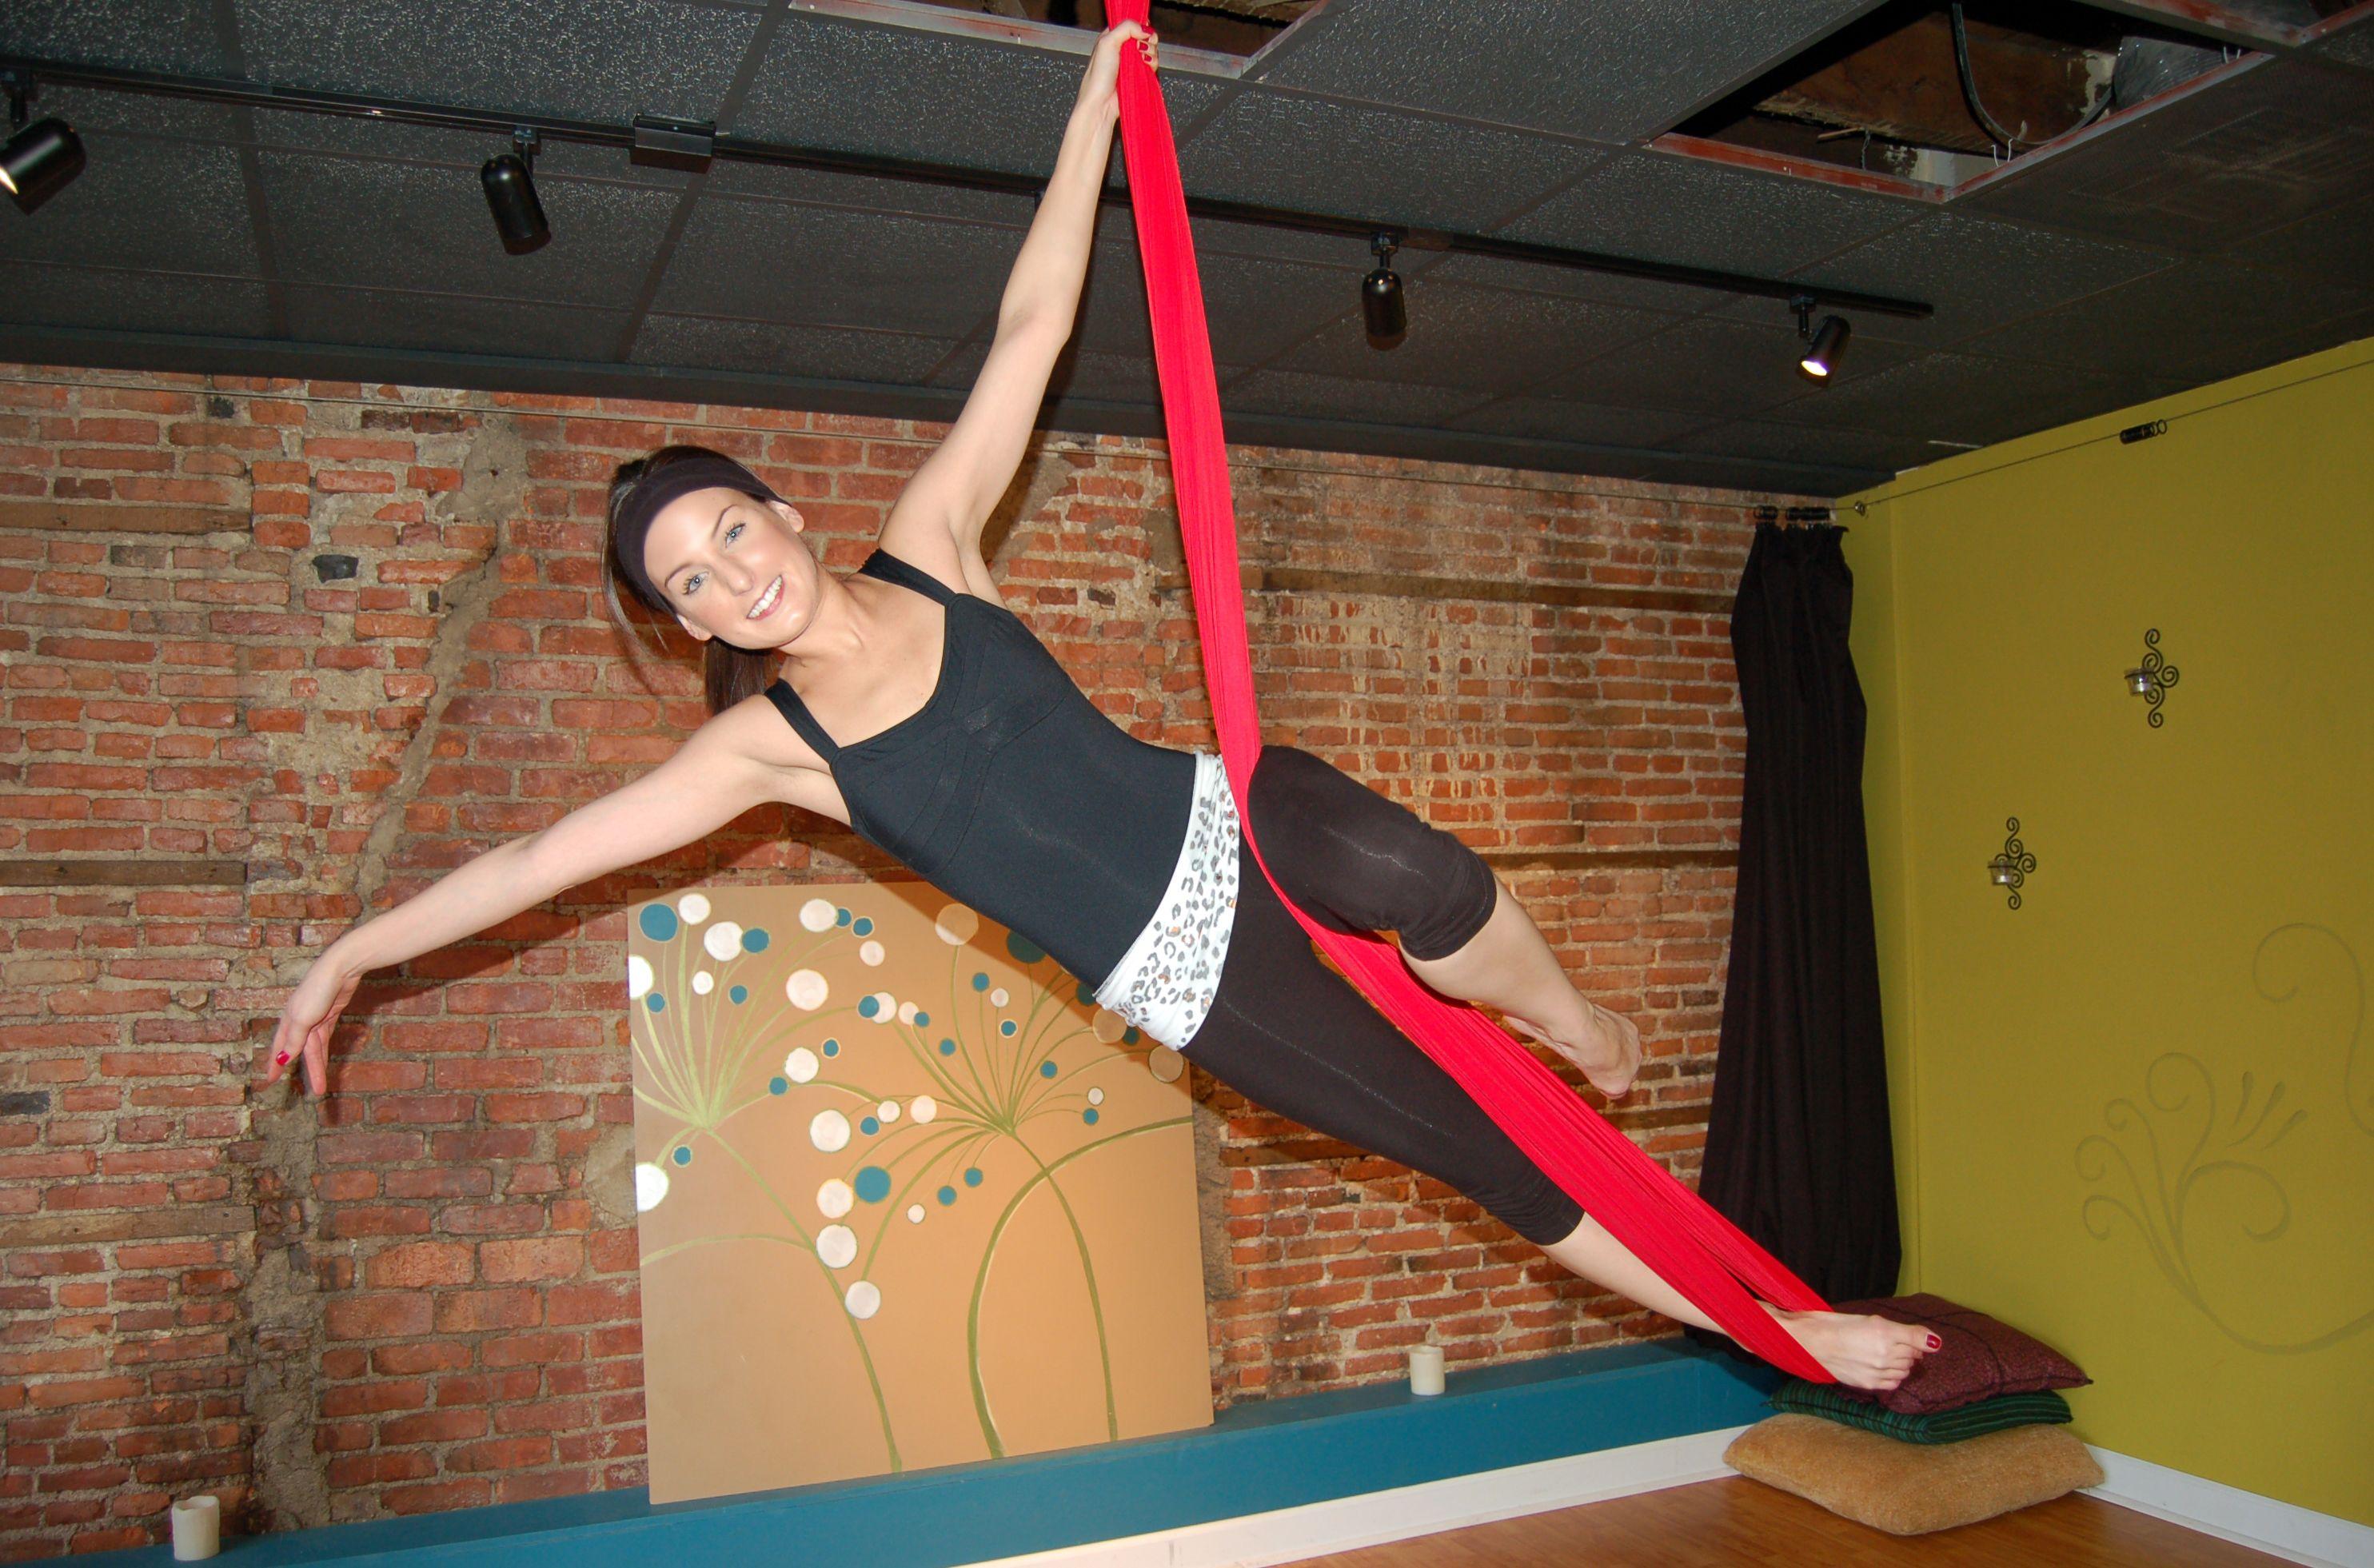 Aerial Sling (Aerial Hammock) Moves! Fall Sideways Pose ...